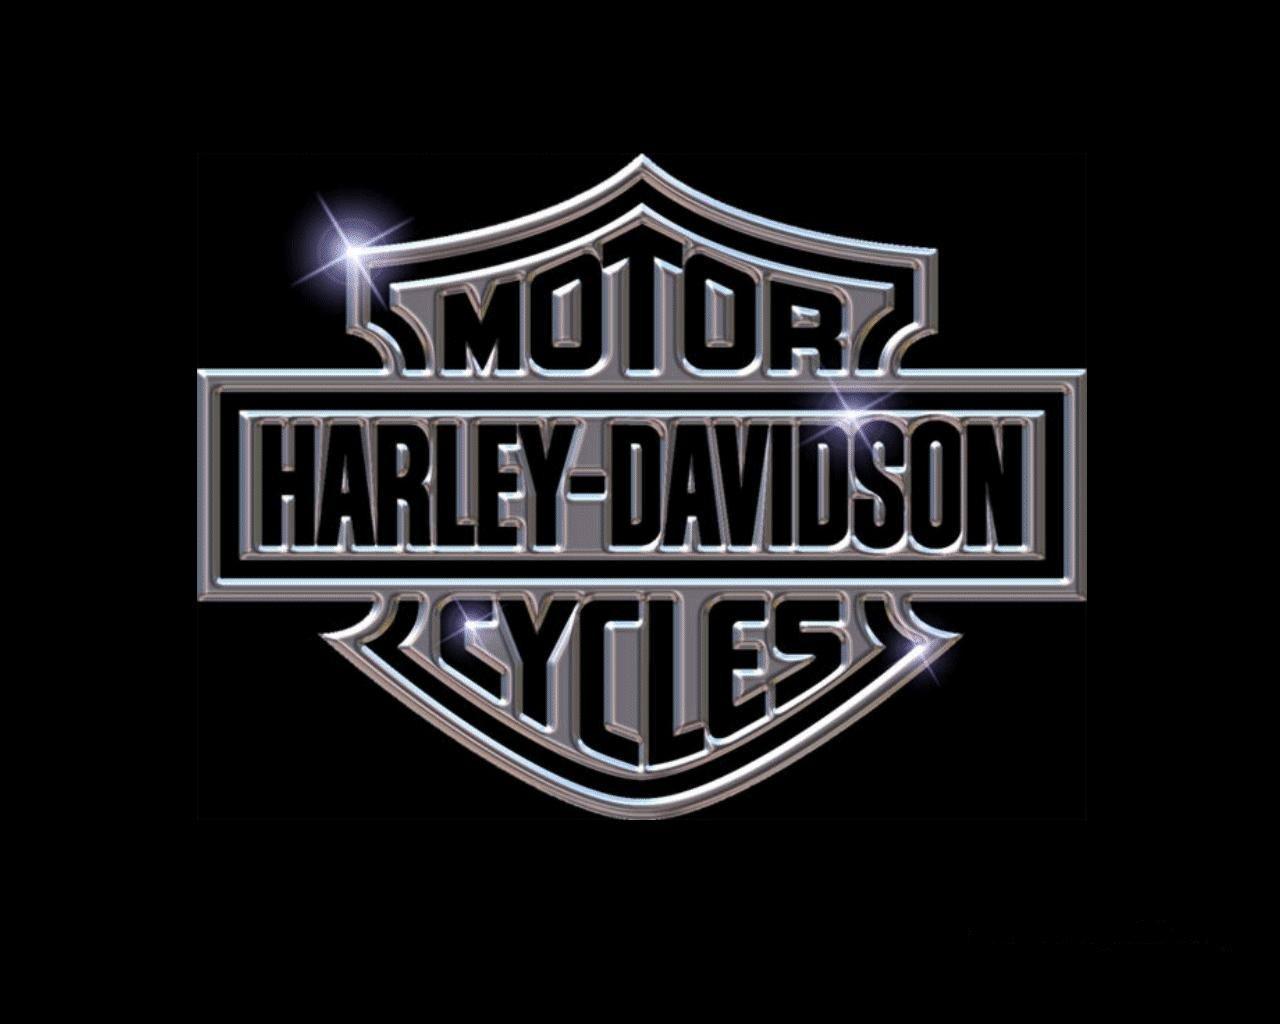 Harley Davidson Logo Wallpaper 1280x1024